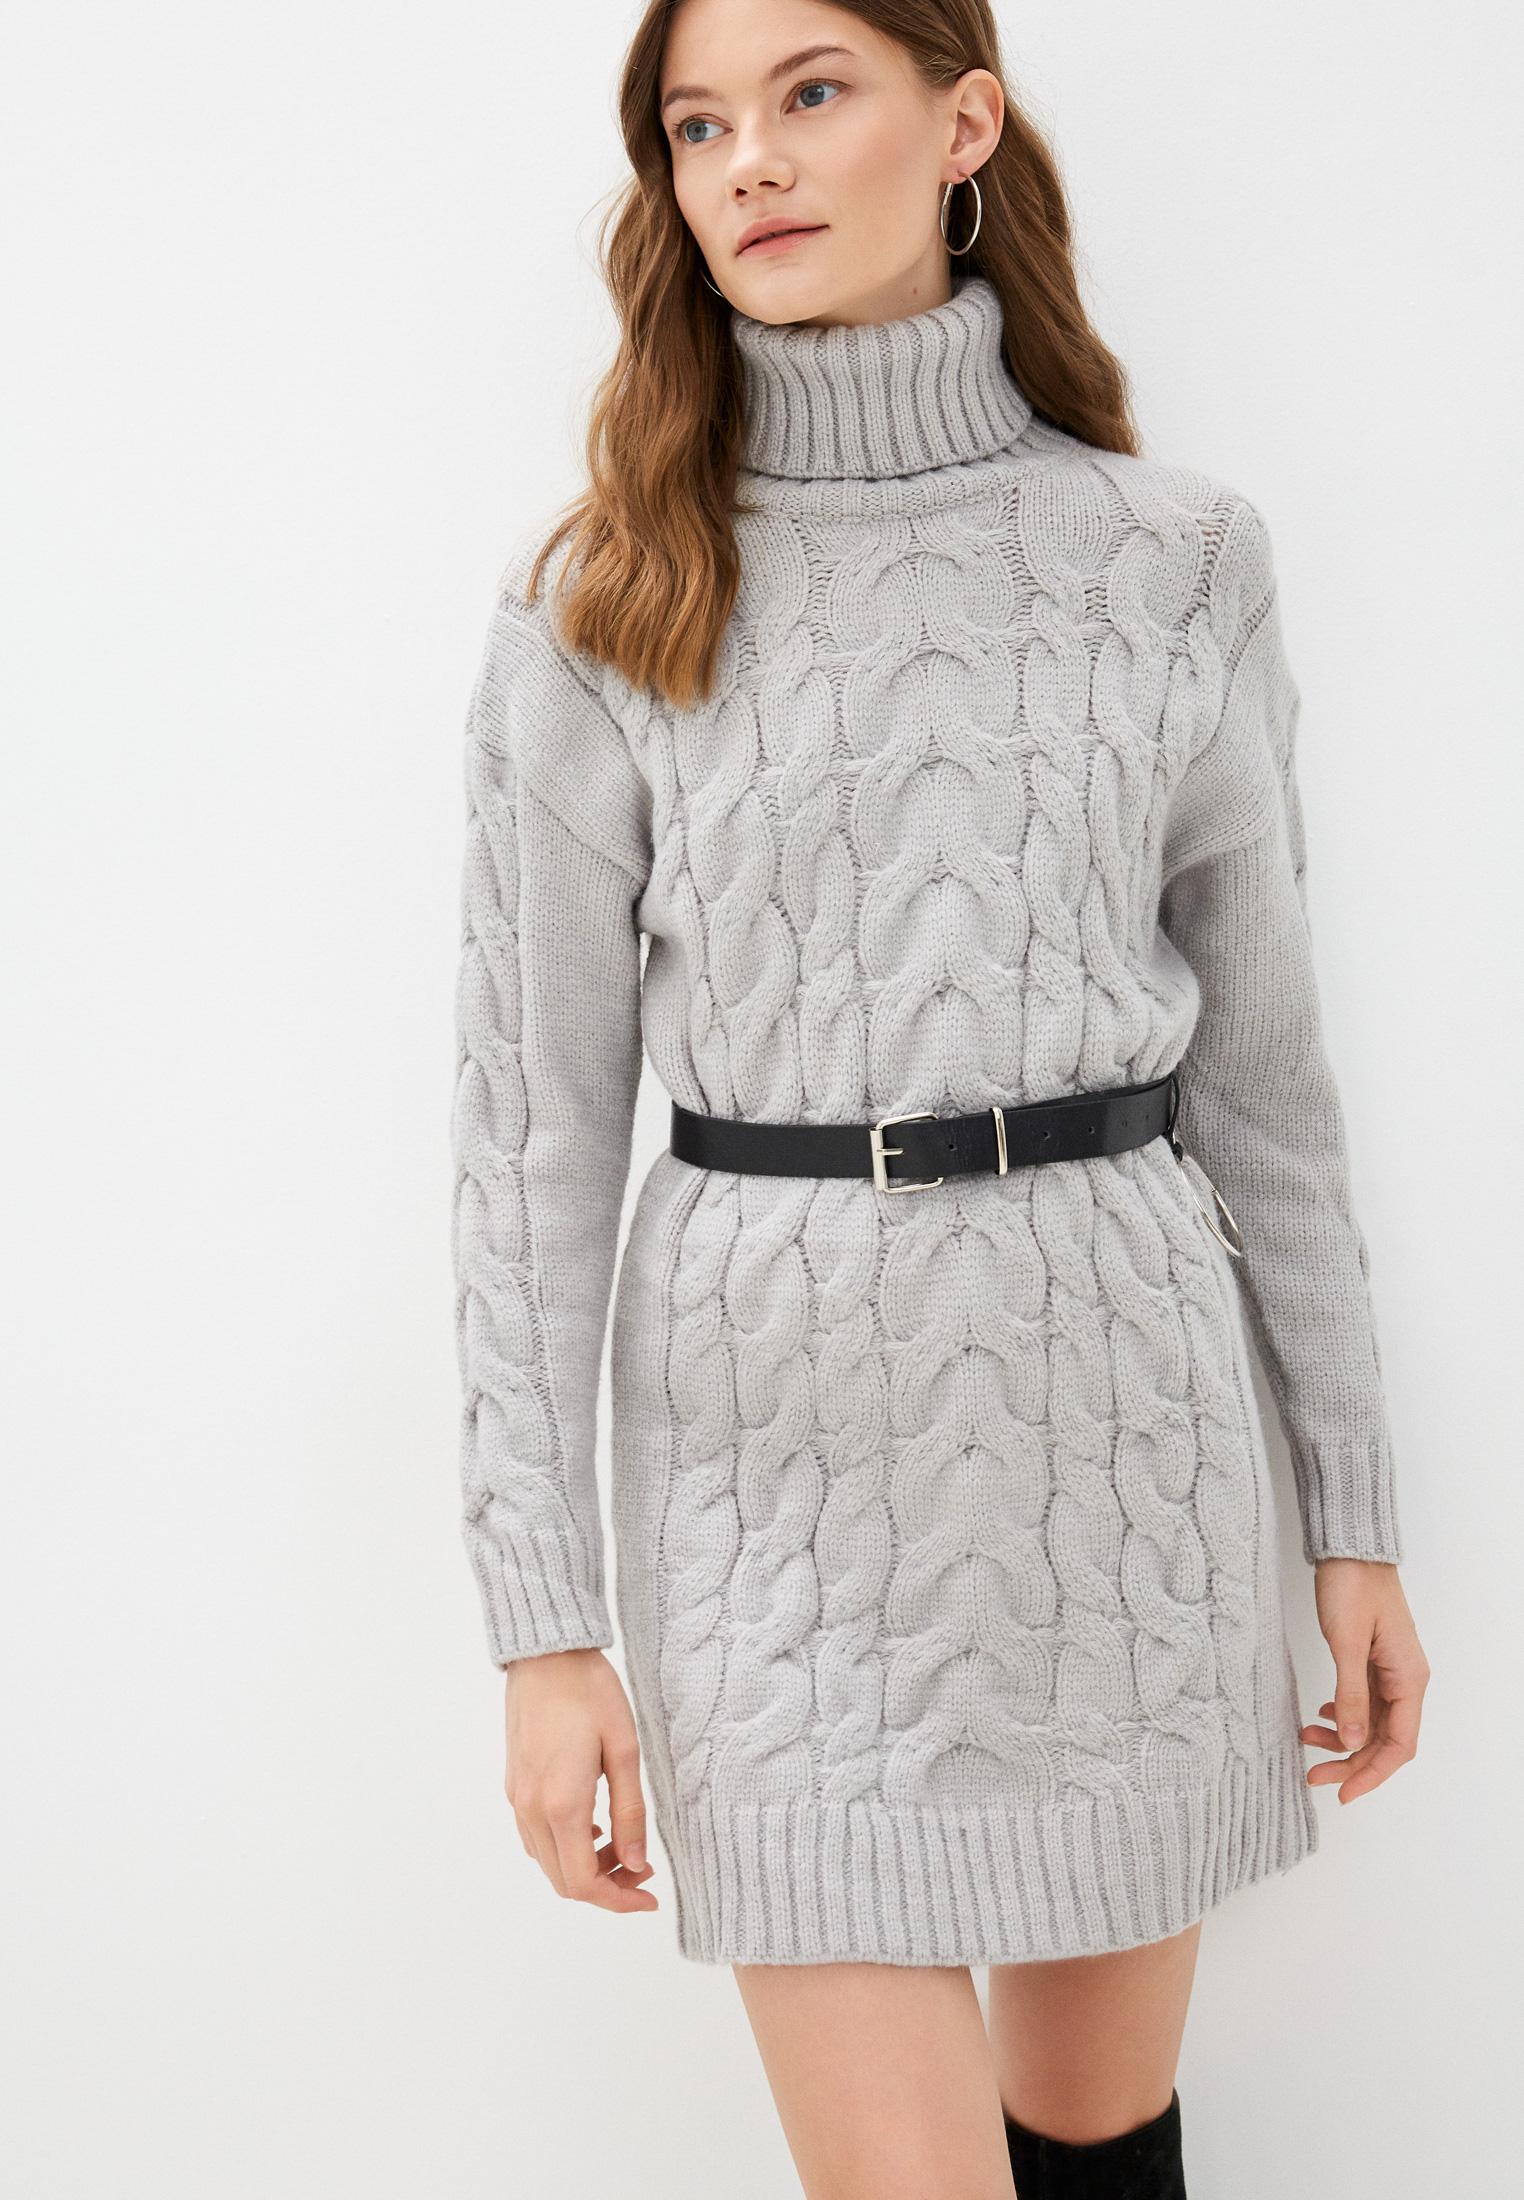 Вязаное платье Vickwool VW279-3